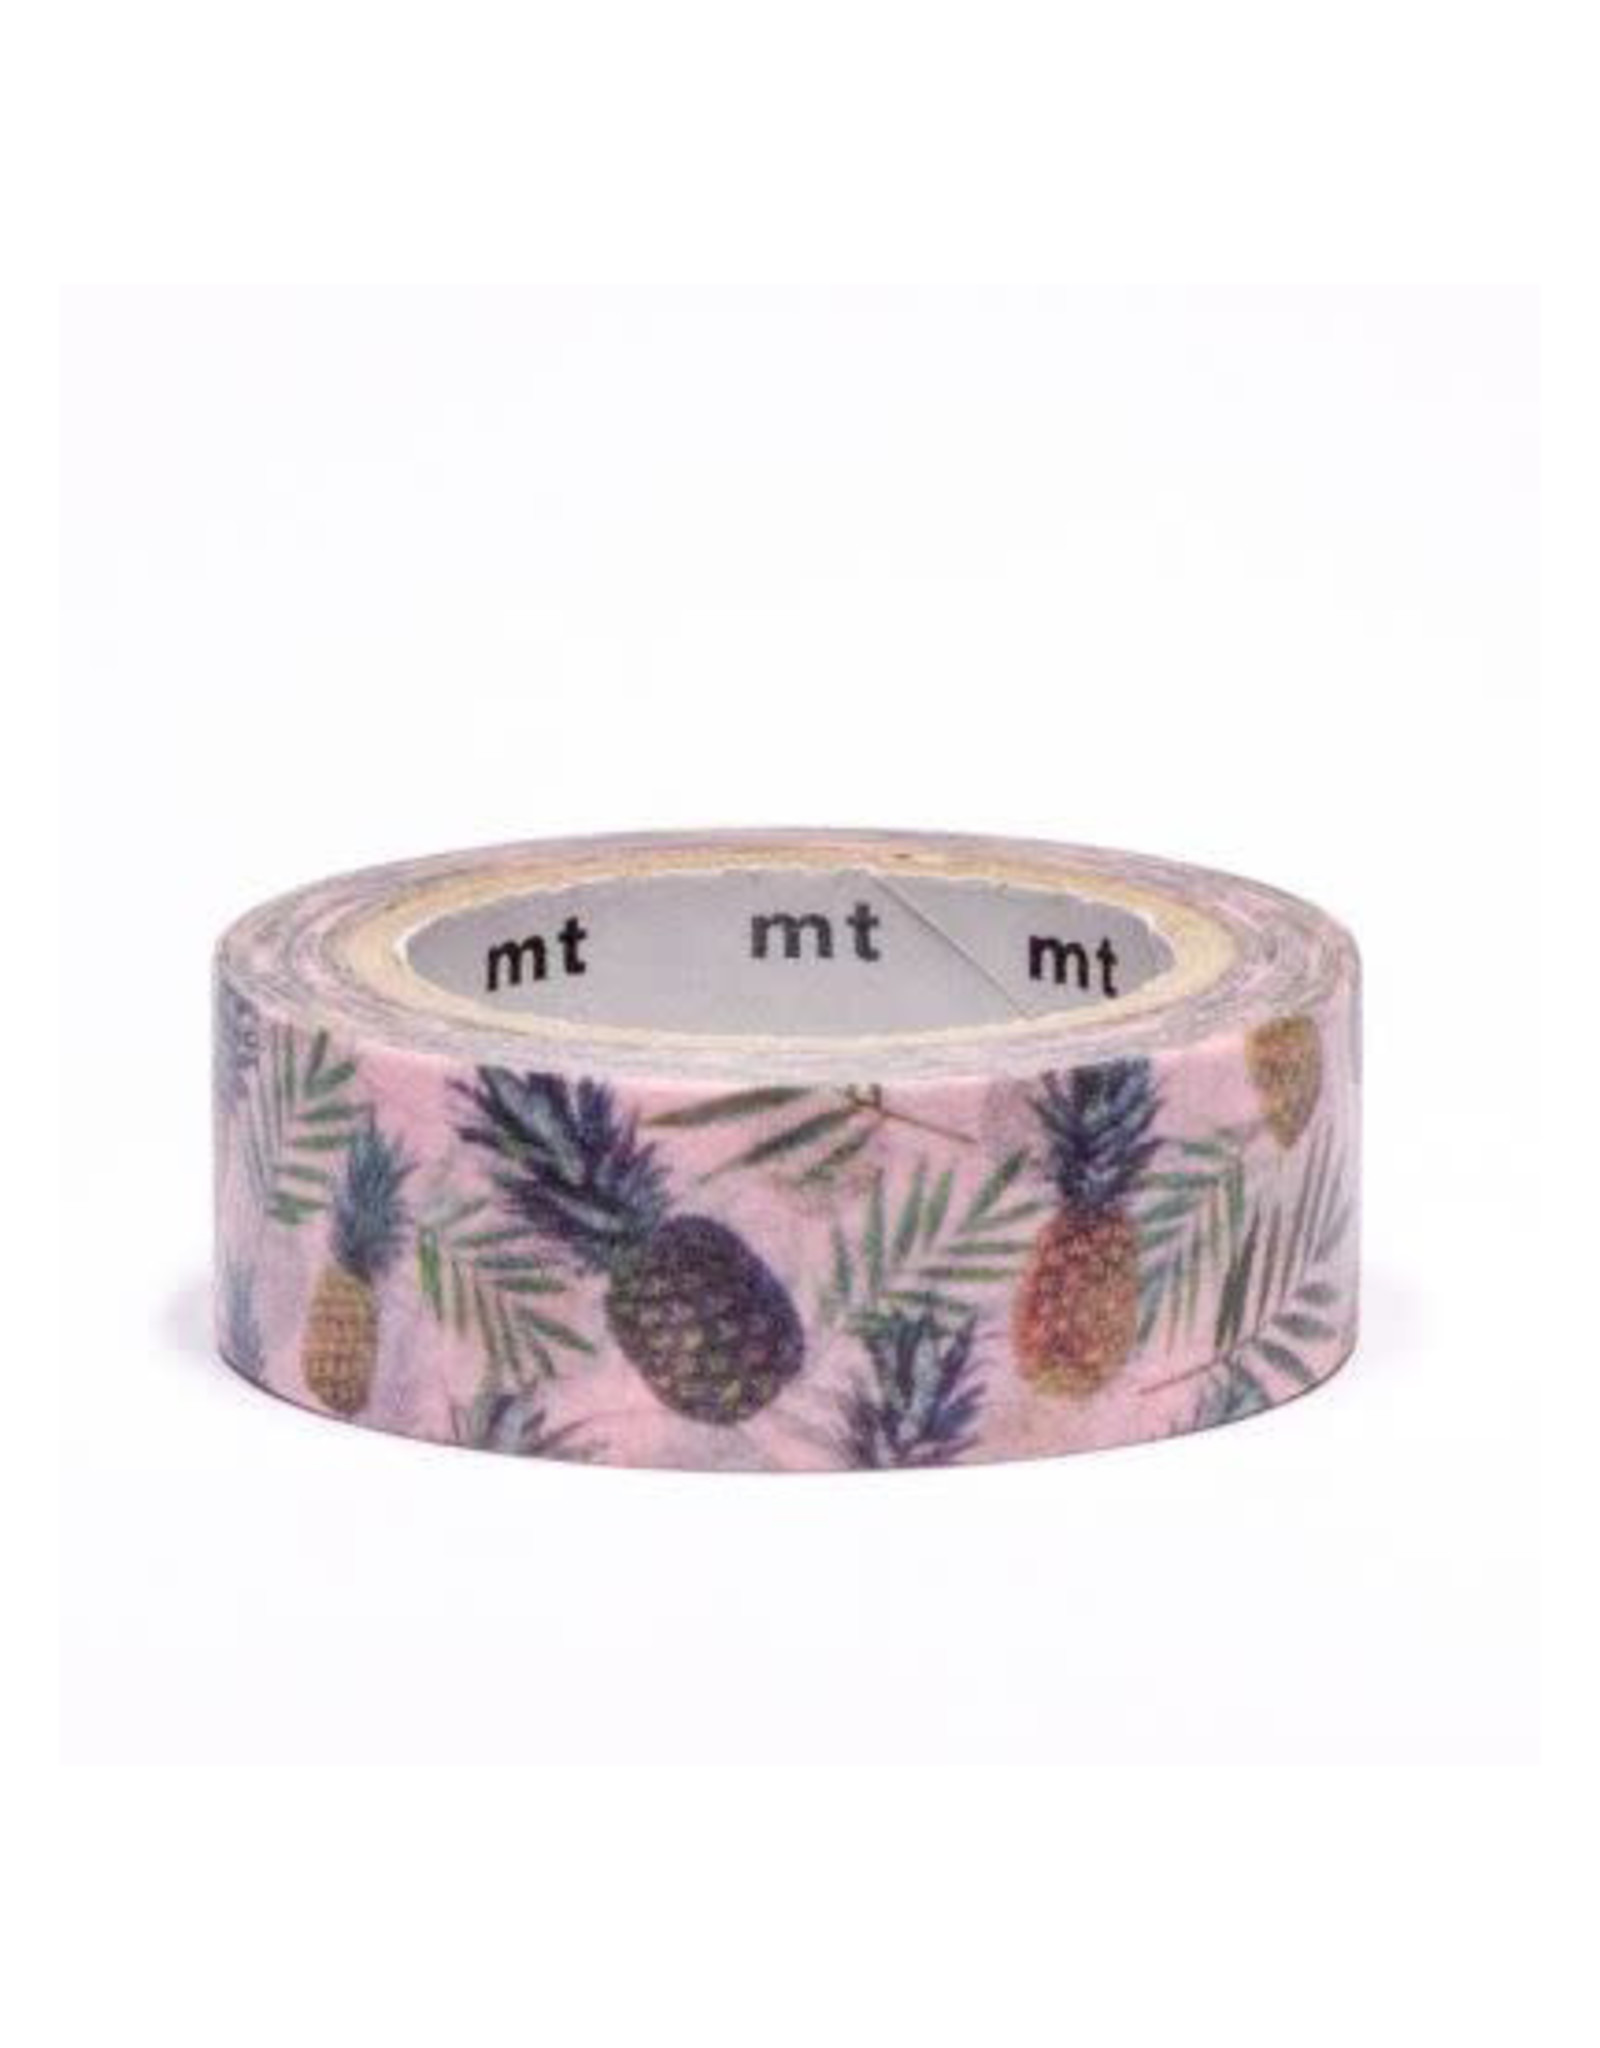 Pineapple Washi Tape